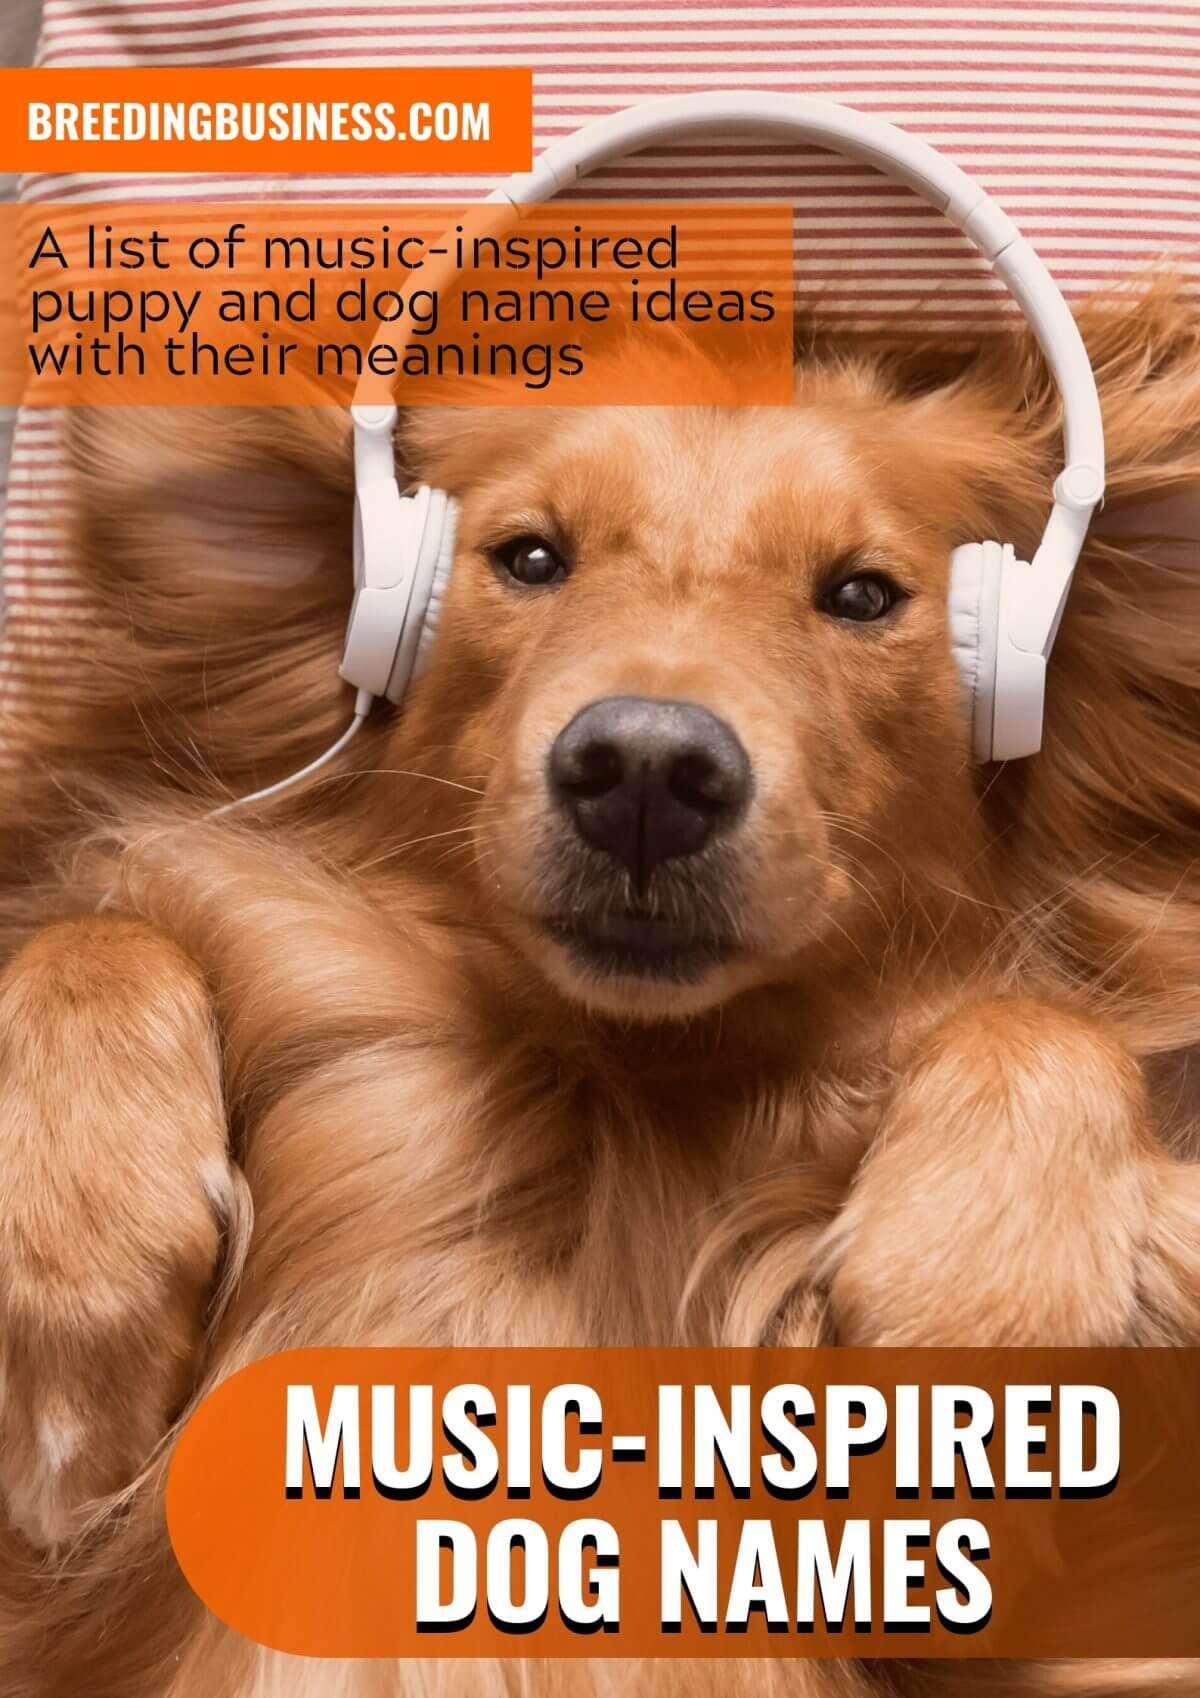 music-inspired dog names